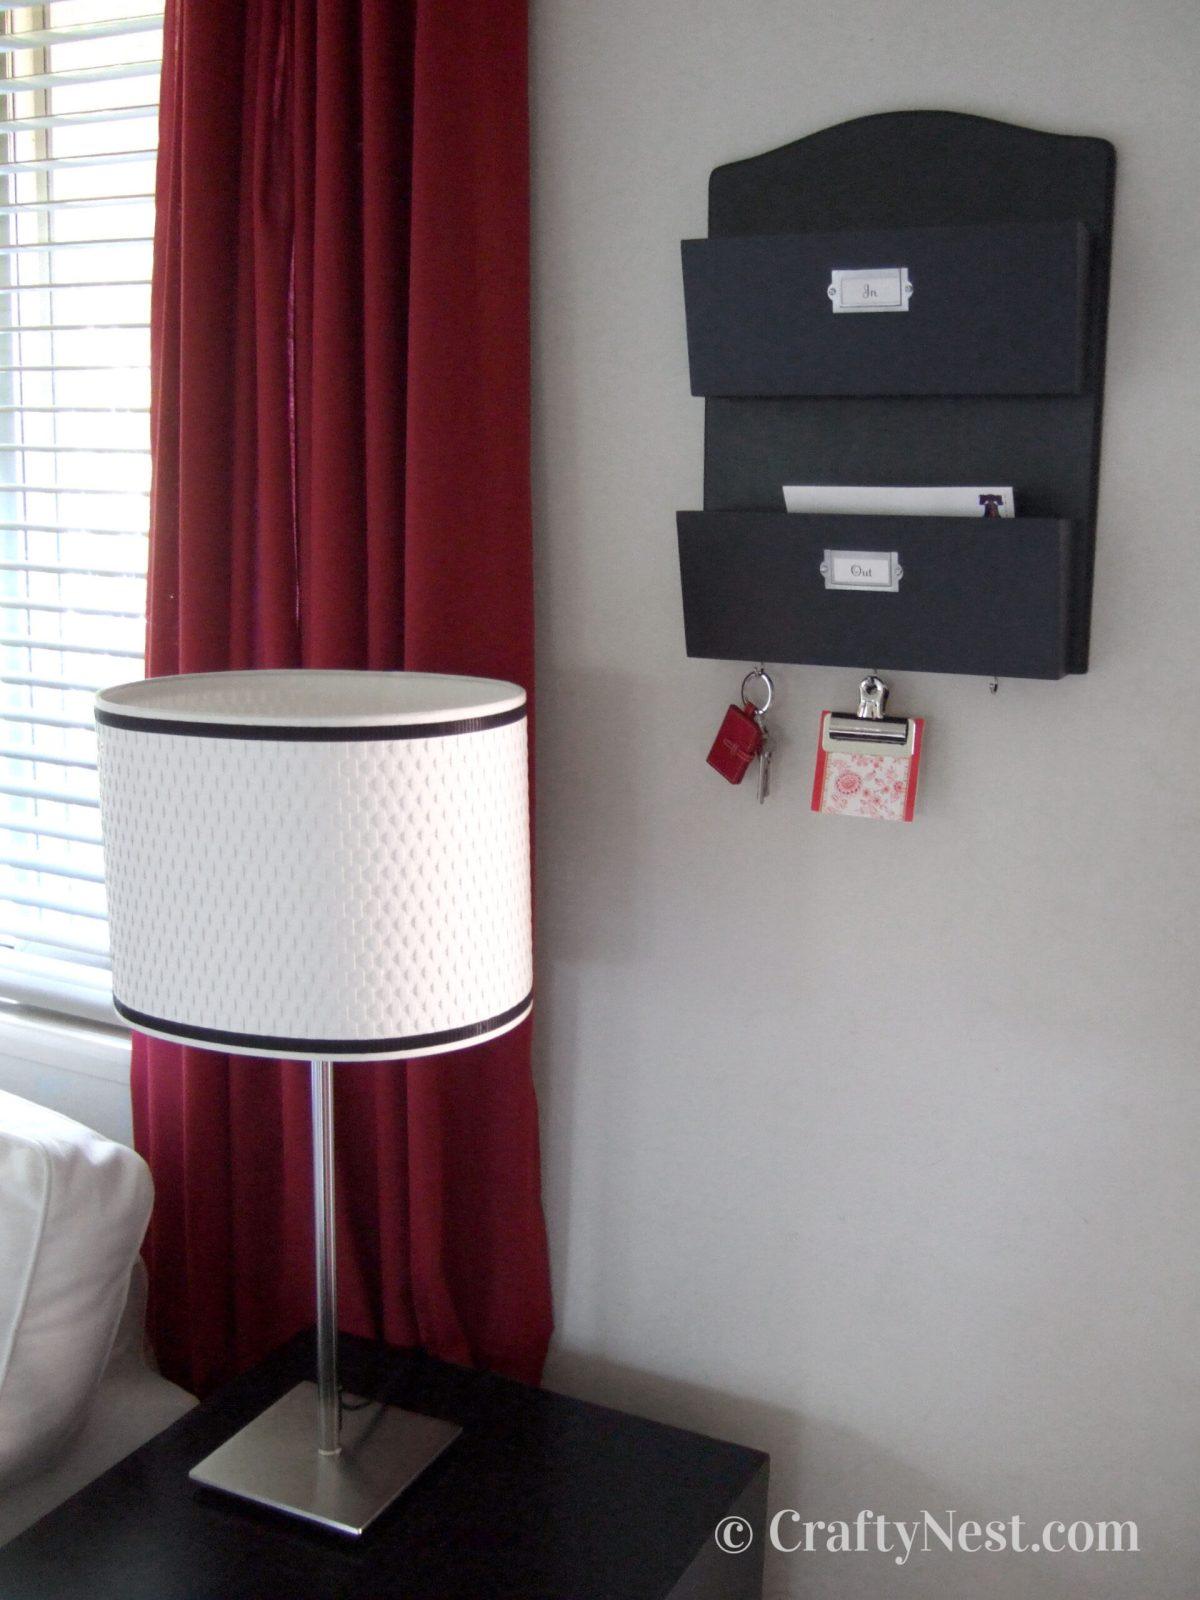 Black letter bin on the wall, photo